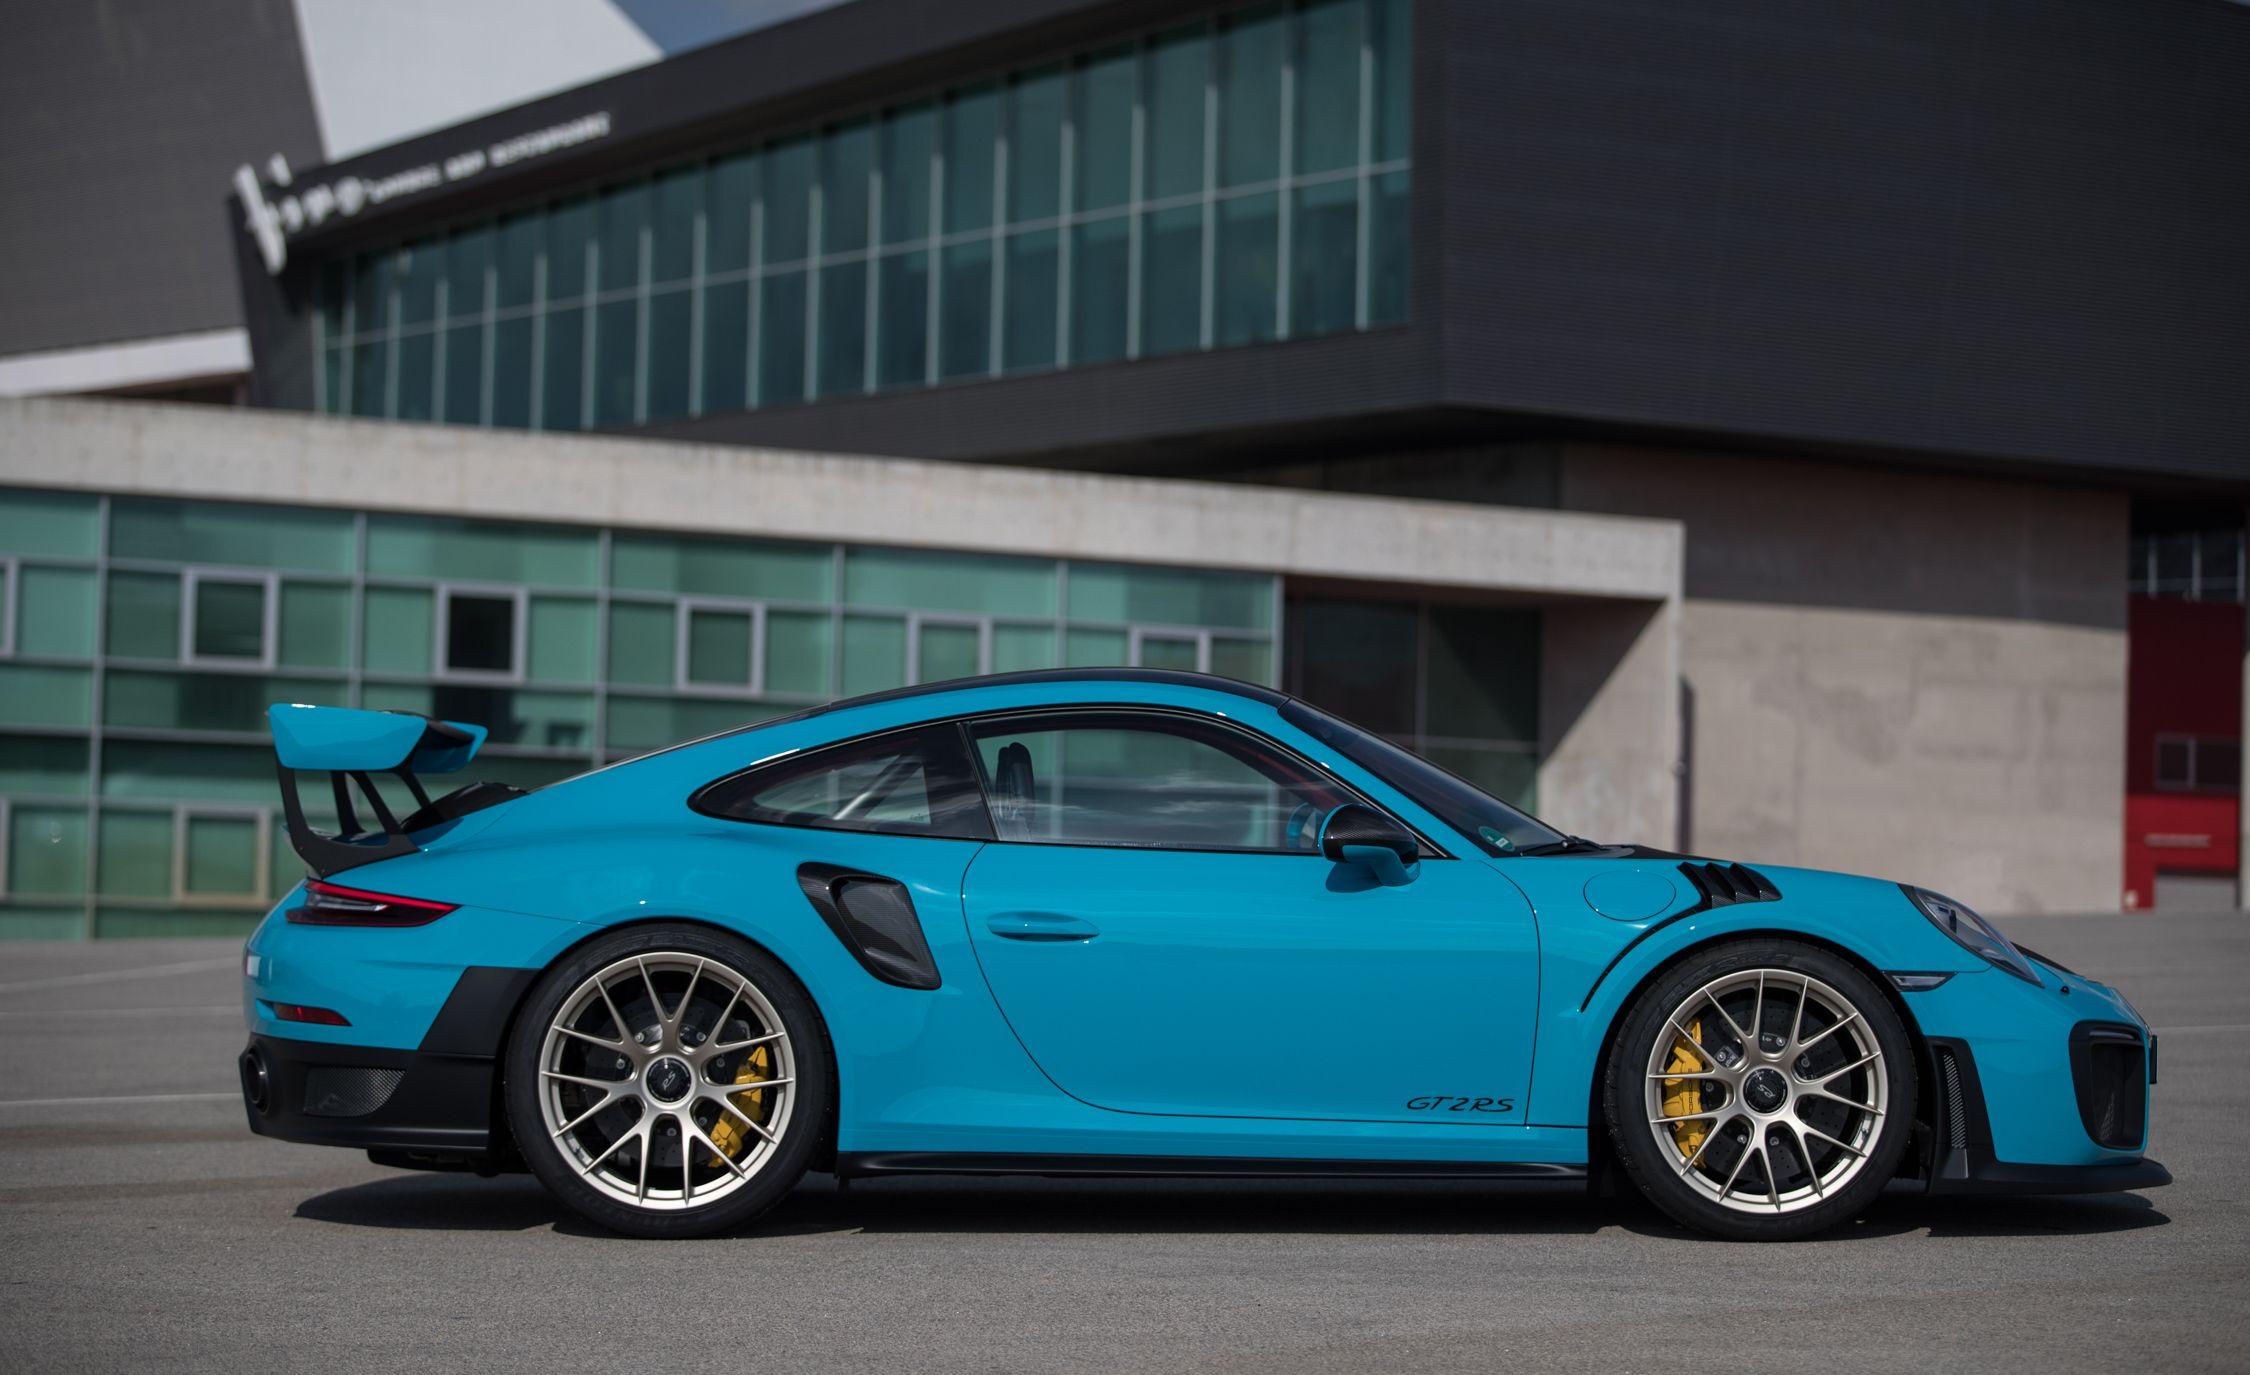 Porsche 911 GT2 RS Reviews | Porsche 911 GT2 RS Price, Photos, and on 2017 porsche cayman s, 2017 porsche carrera gt, 2017 porsche carrera s, 2017 porsche turbo s, 2017 porsche gt3, 2017 porsche 911 turbo, 2017 porsche turbo cabriolet,